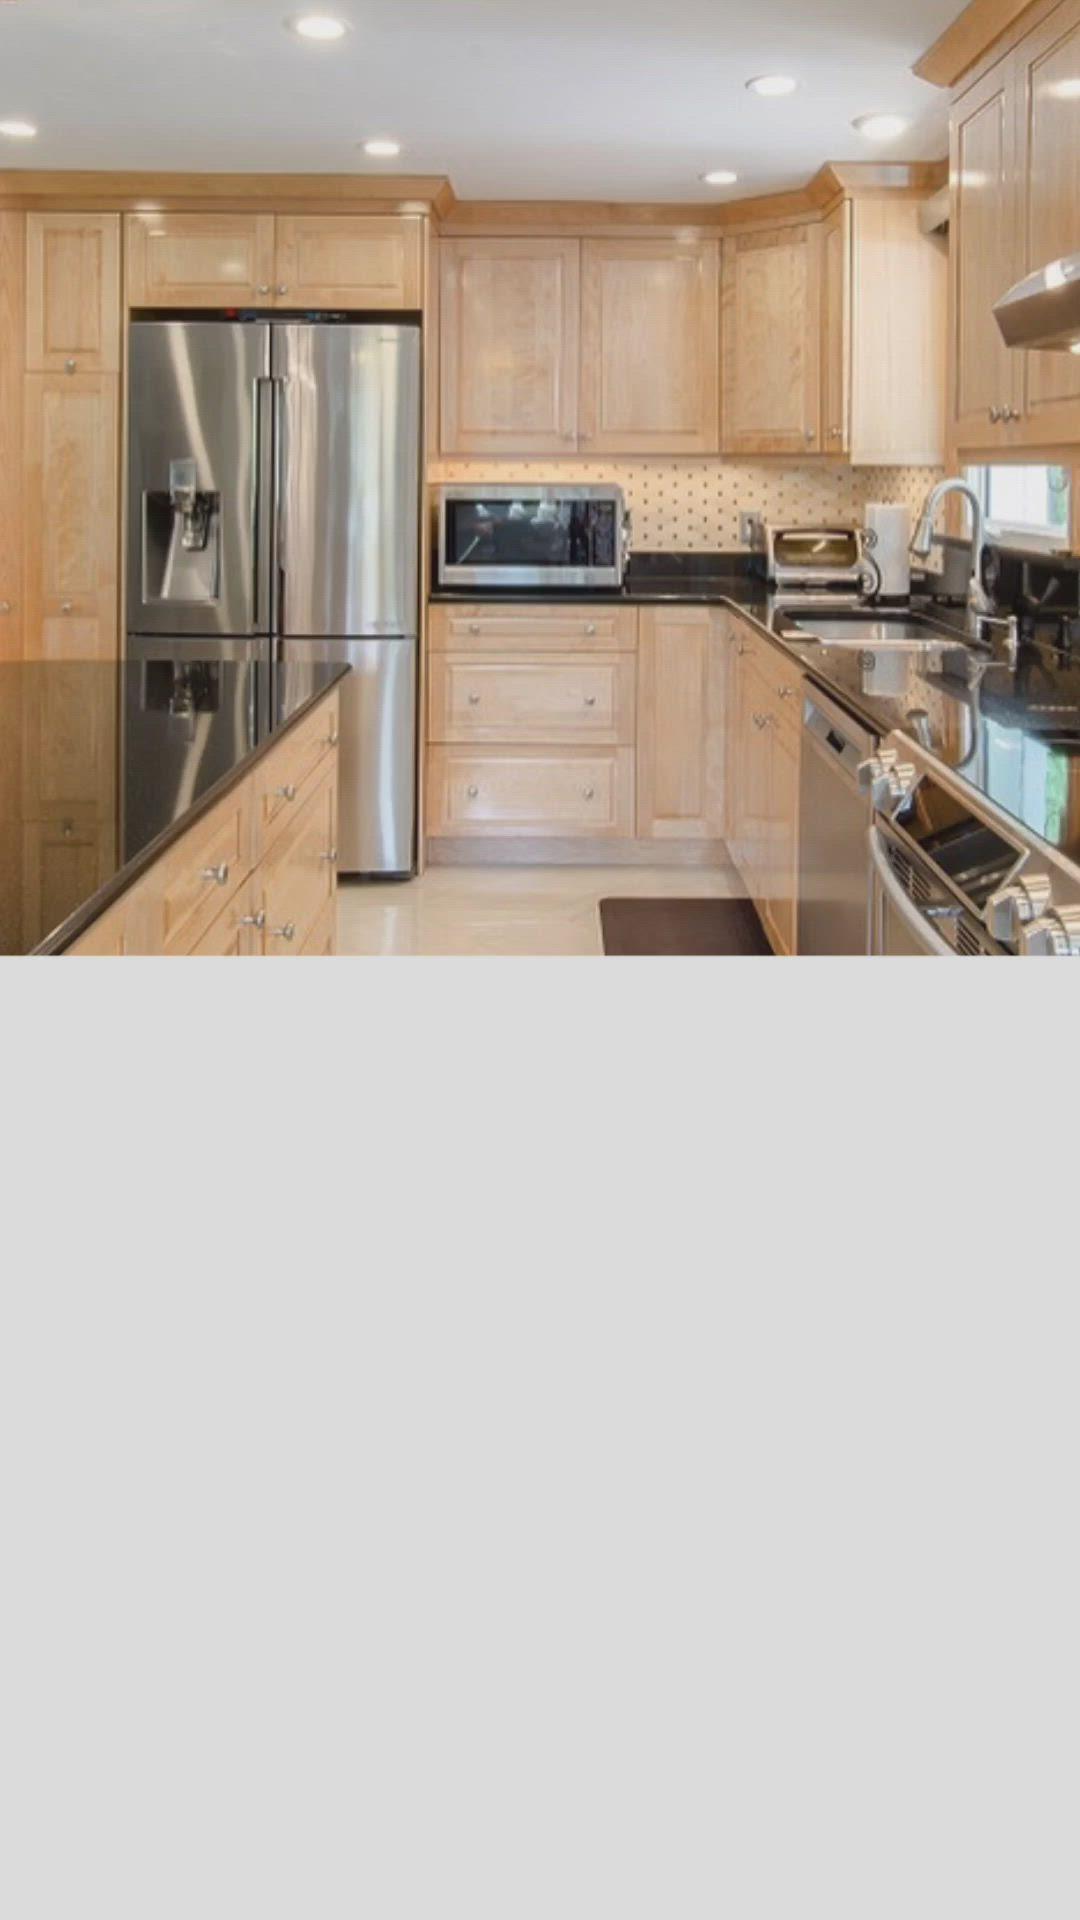 Dream Kitchens In Nashua Nh Video In 2020 Modern Kitchen Design White Kitchen Cabinets Kitchen Remodel Design